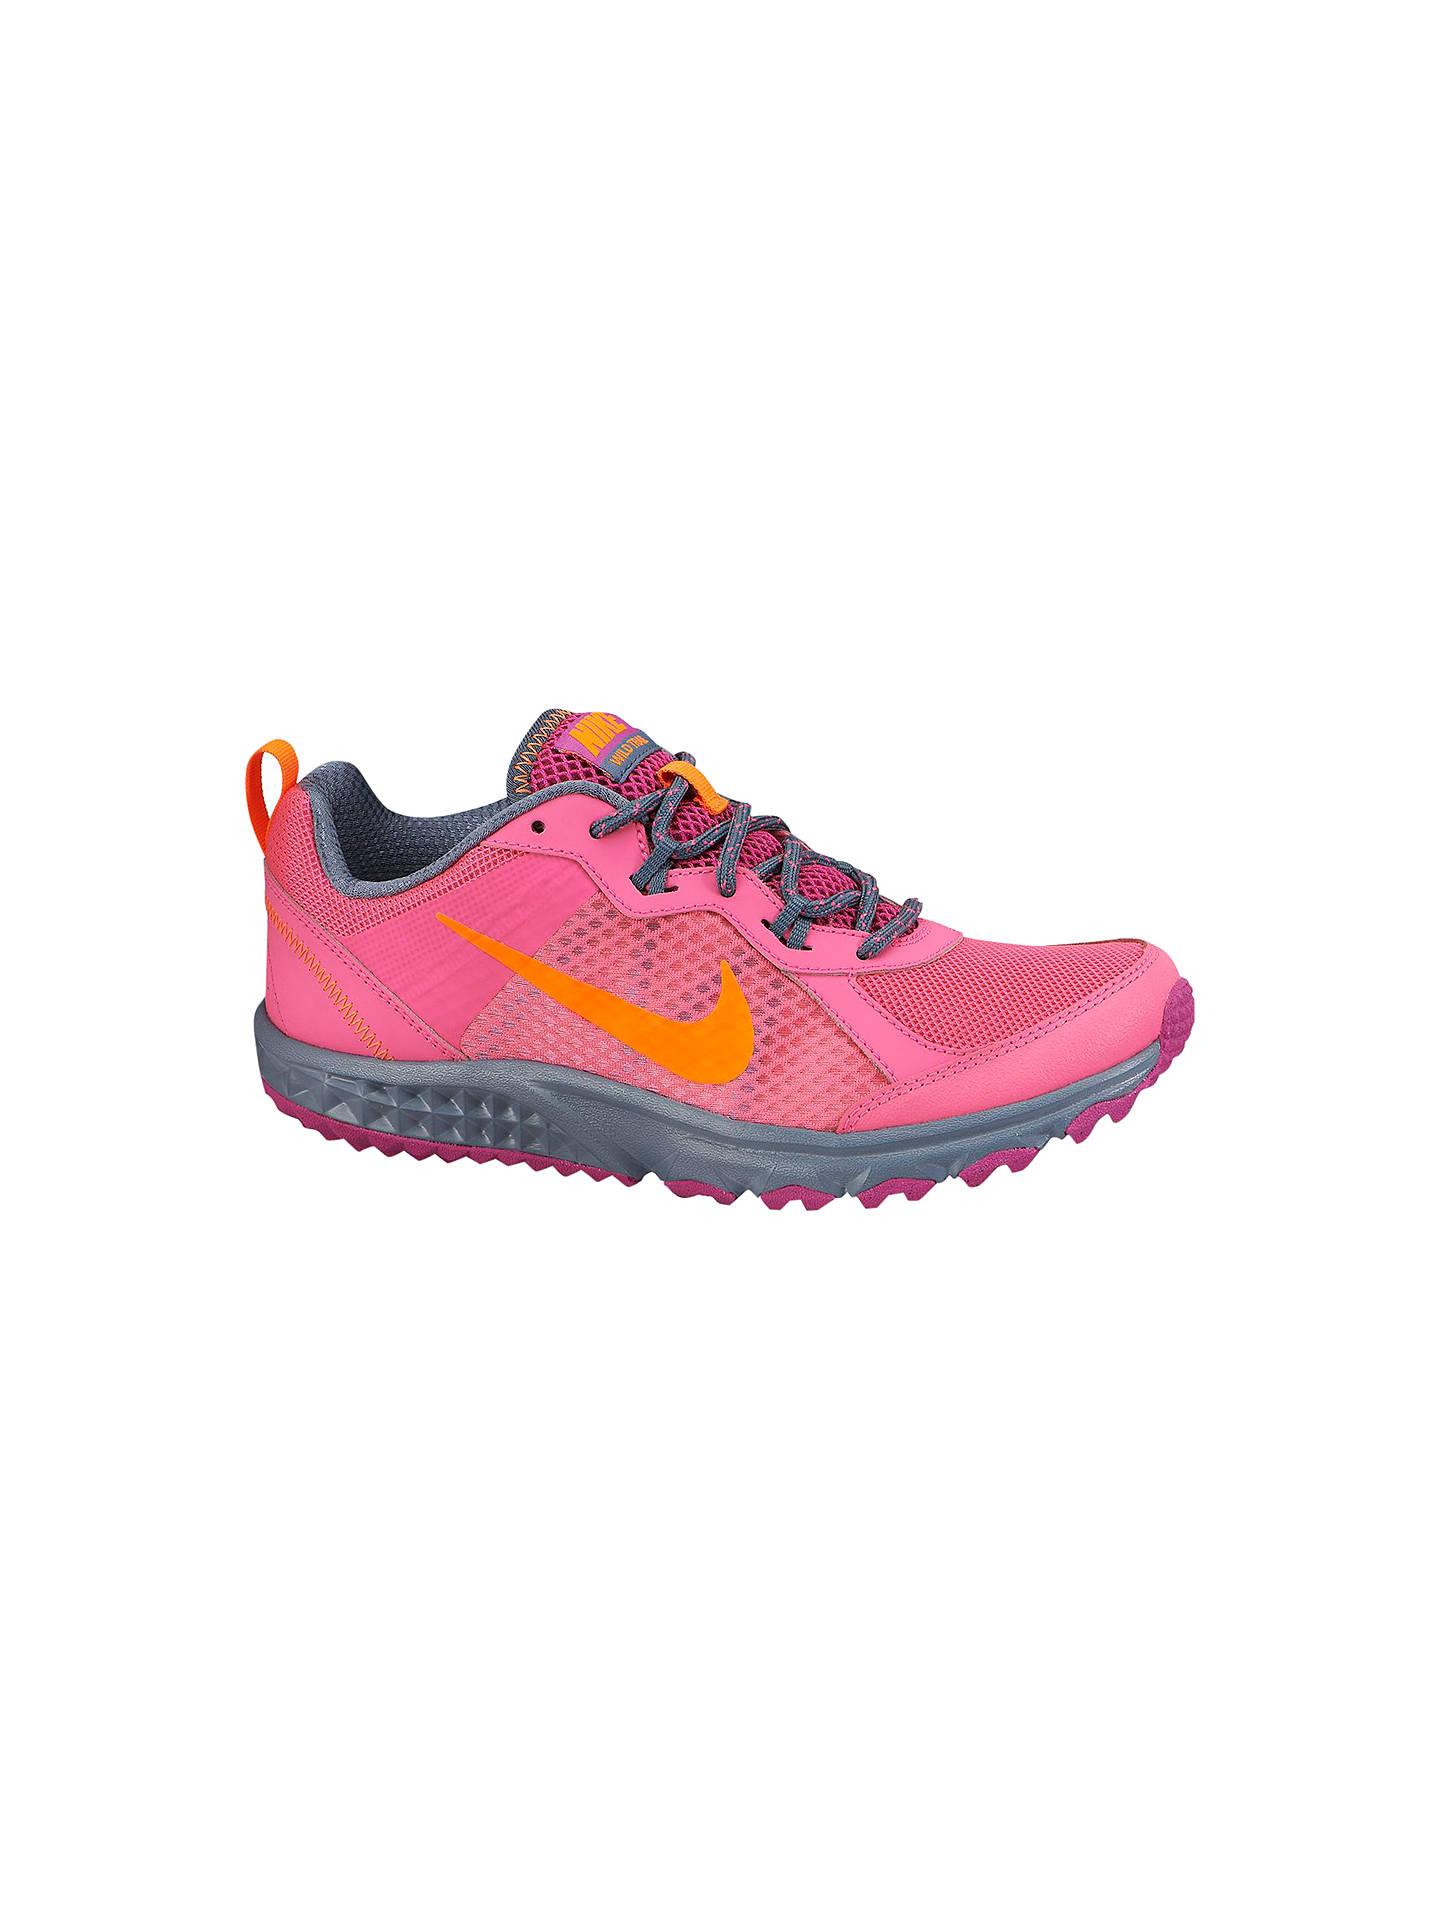 50eafdf08d81c Buy Nike Wild Trail Running Shoes